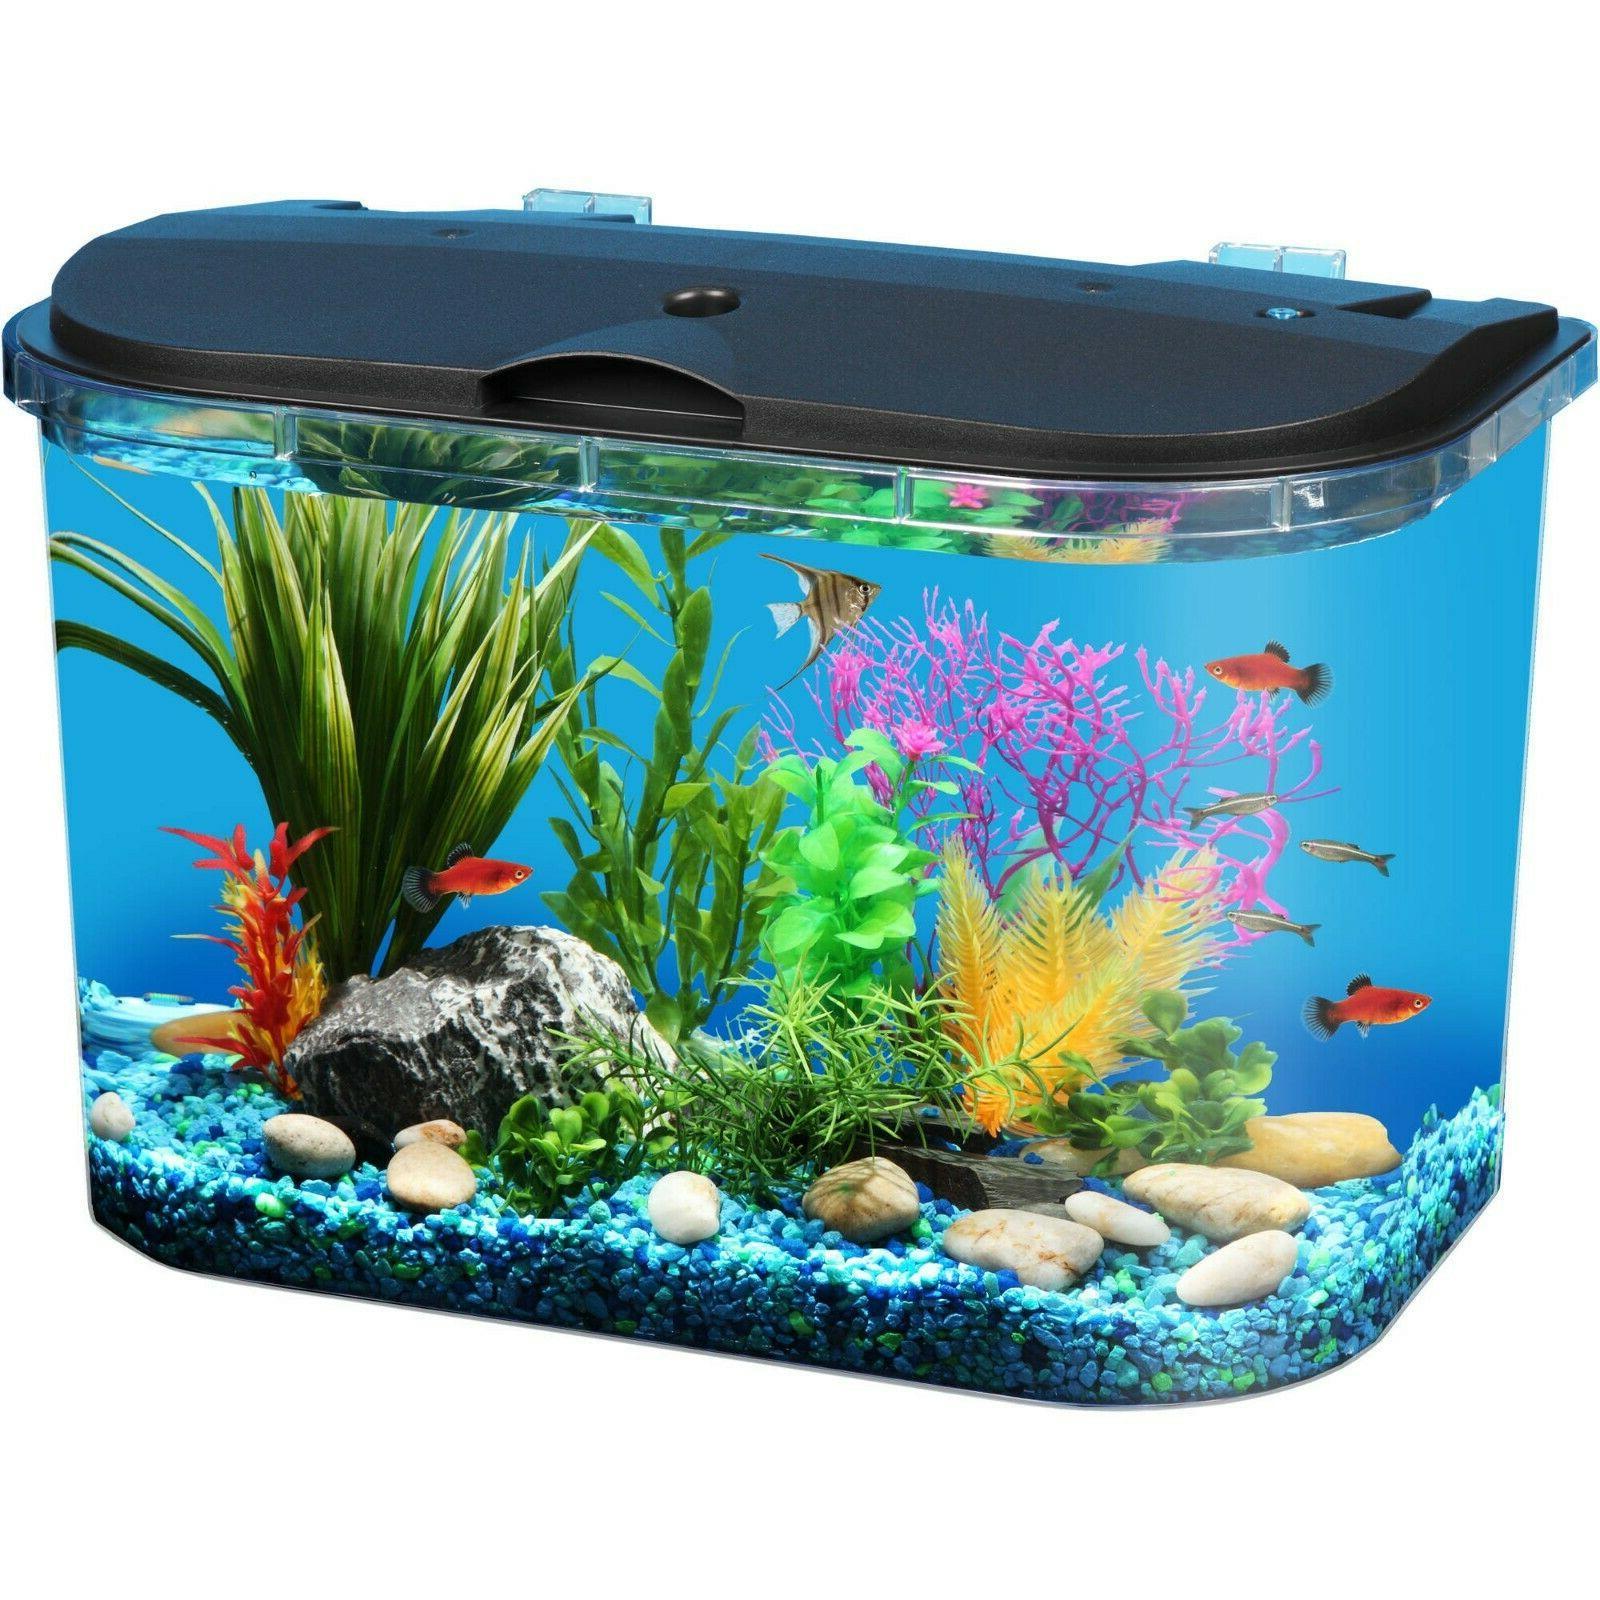 5-Gallon Fish Tank Panaview Aquarium with LED Lighting Kids